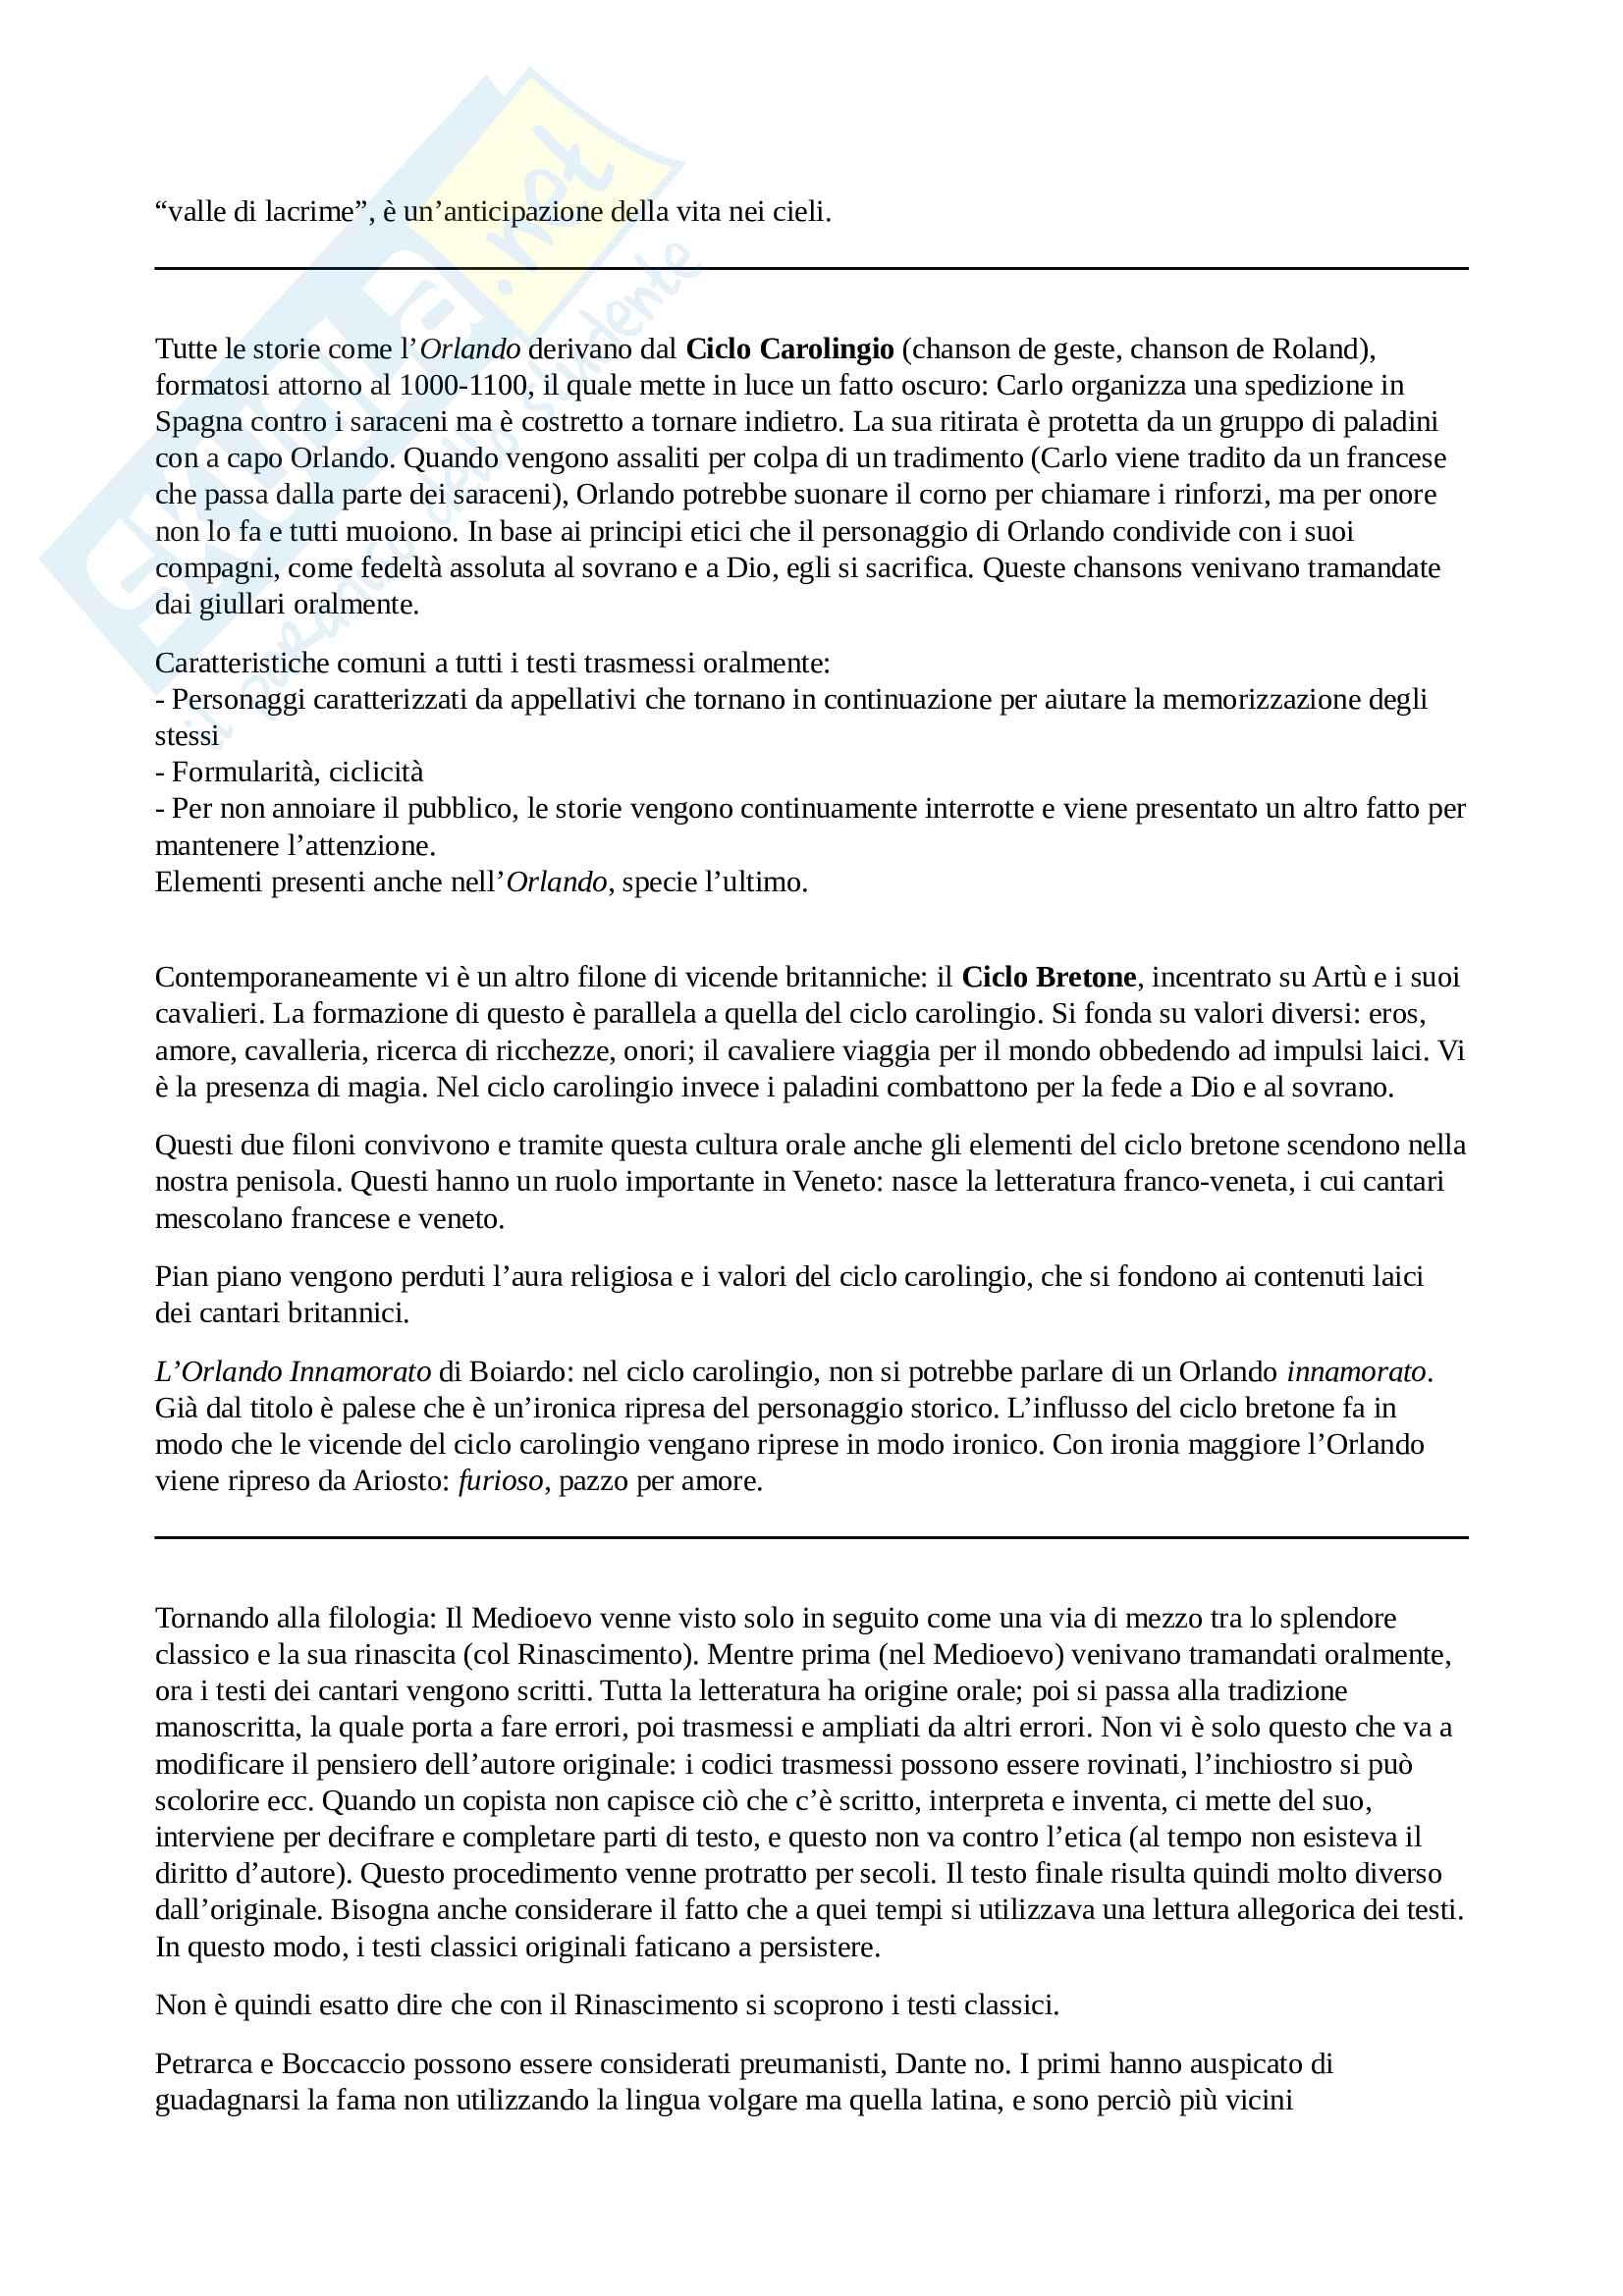 Orlando Furioso - Letteratura Italiana, prof. Rusi Pag. 2